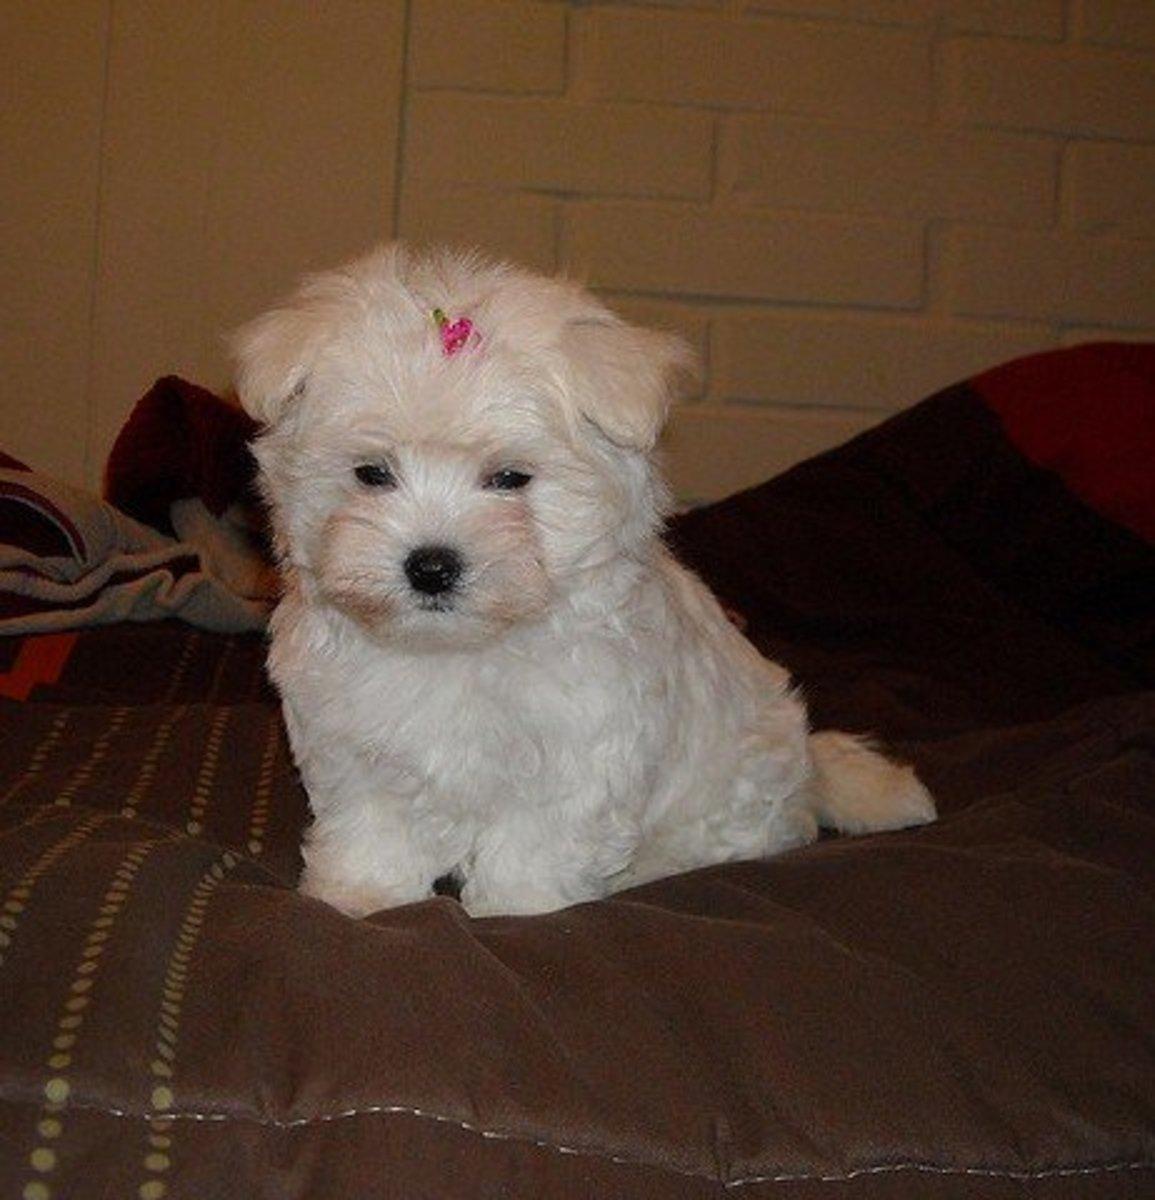 A tiny, fluffy, Maltese puppy.